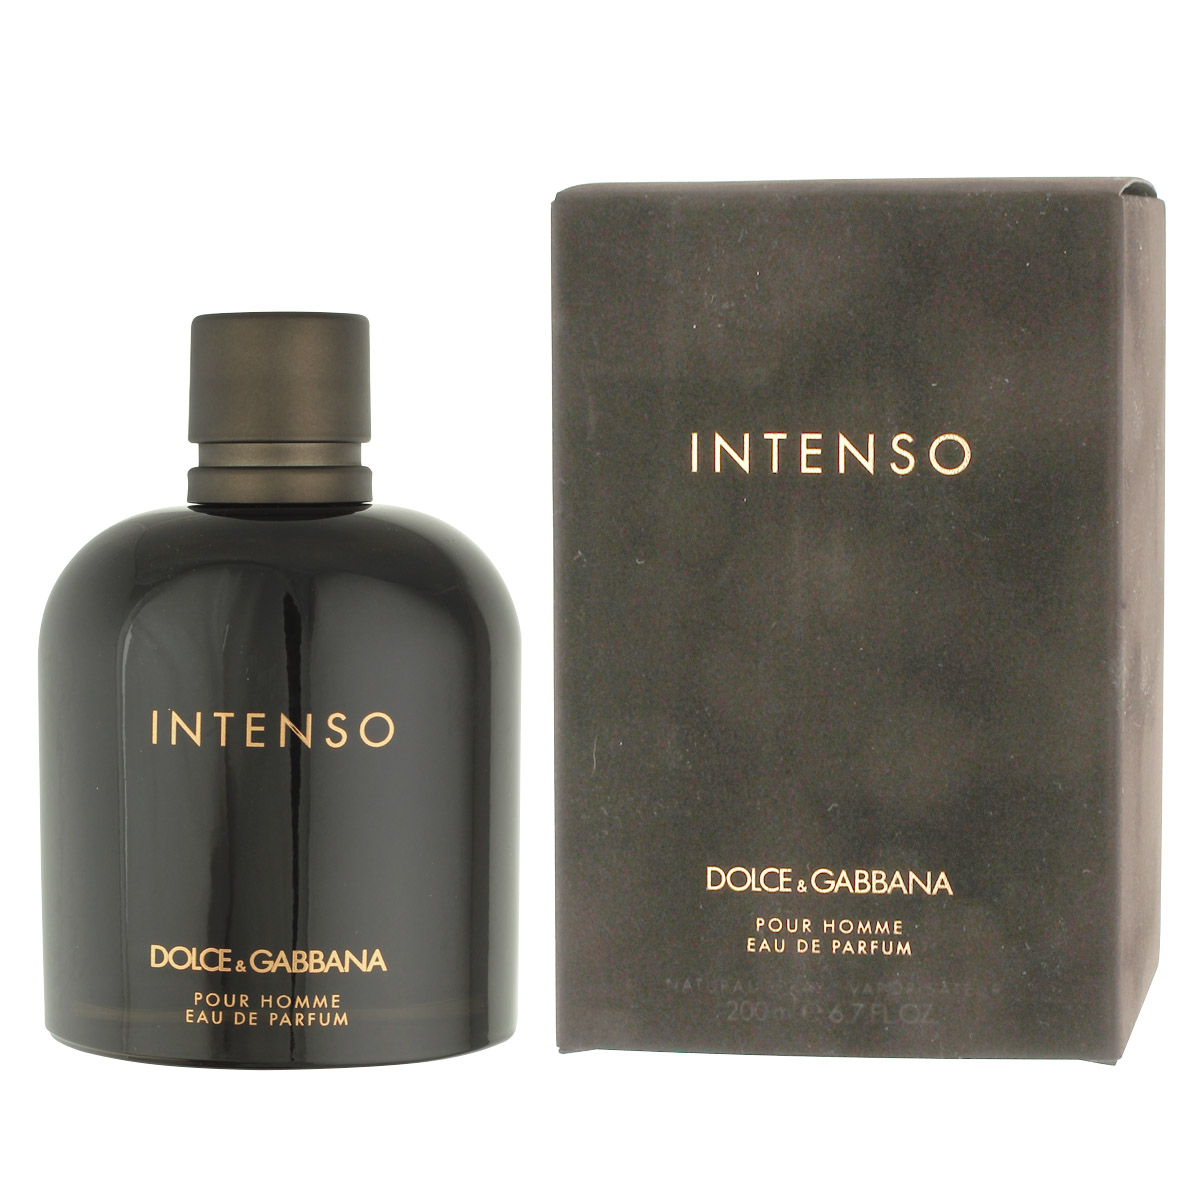 dolce gabbana intenso eau de parfum 200 ml preisvergleich. Black Bedroom Furniture Sets. Home Design Ideas